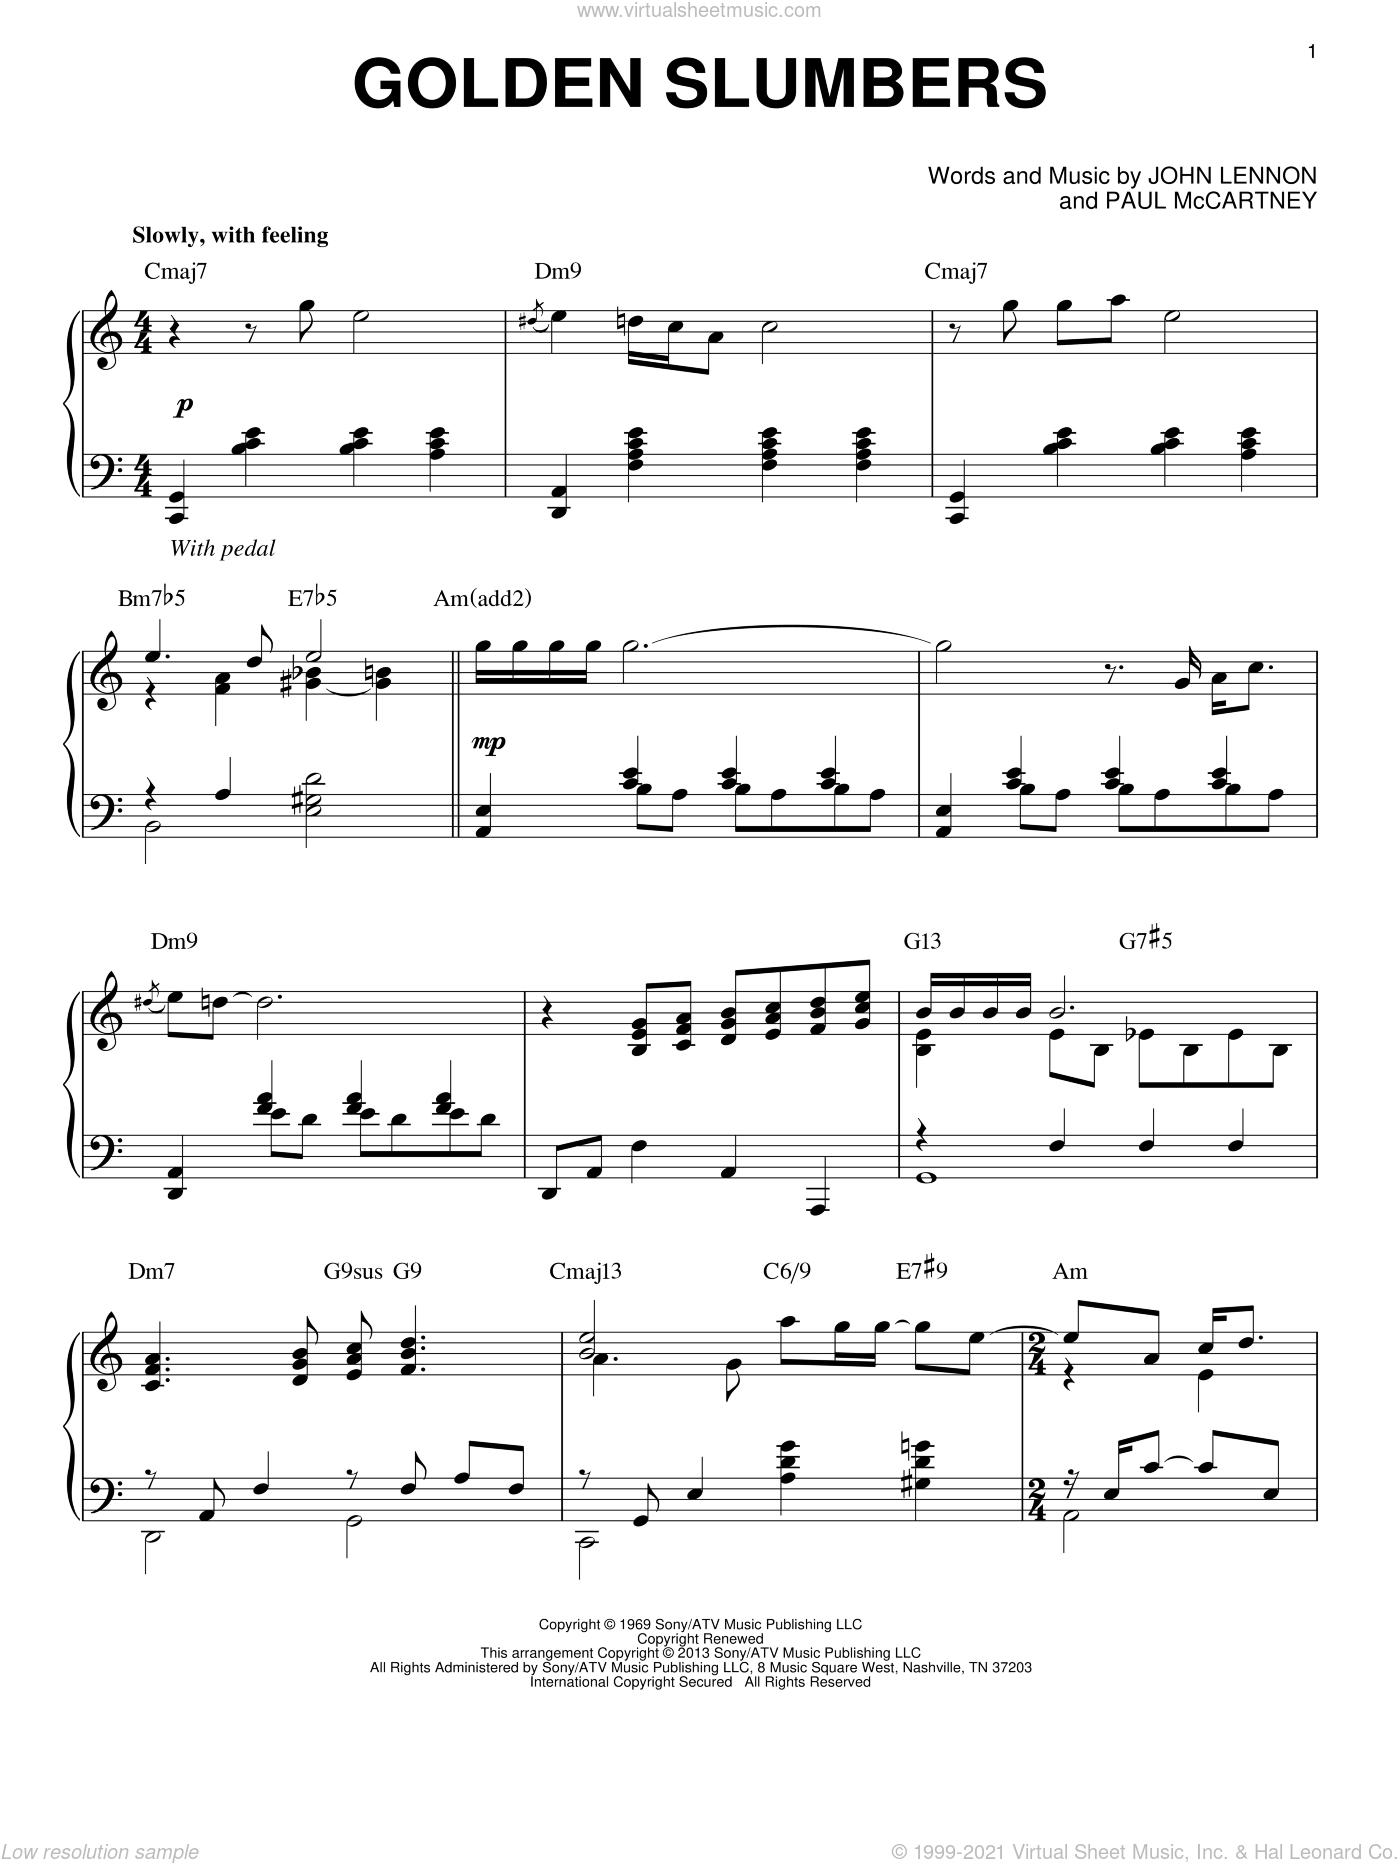 Golden Slumbers sheet music for piano solo by The Beatles, John Lennon and Paul McCartney, intermediate skill level